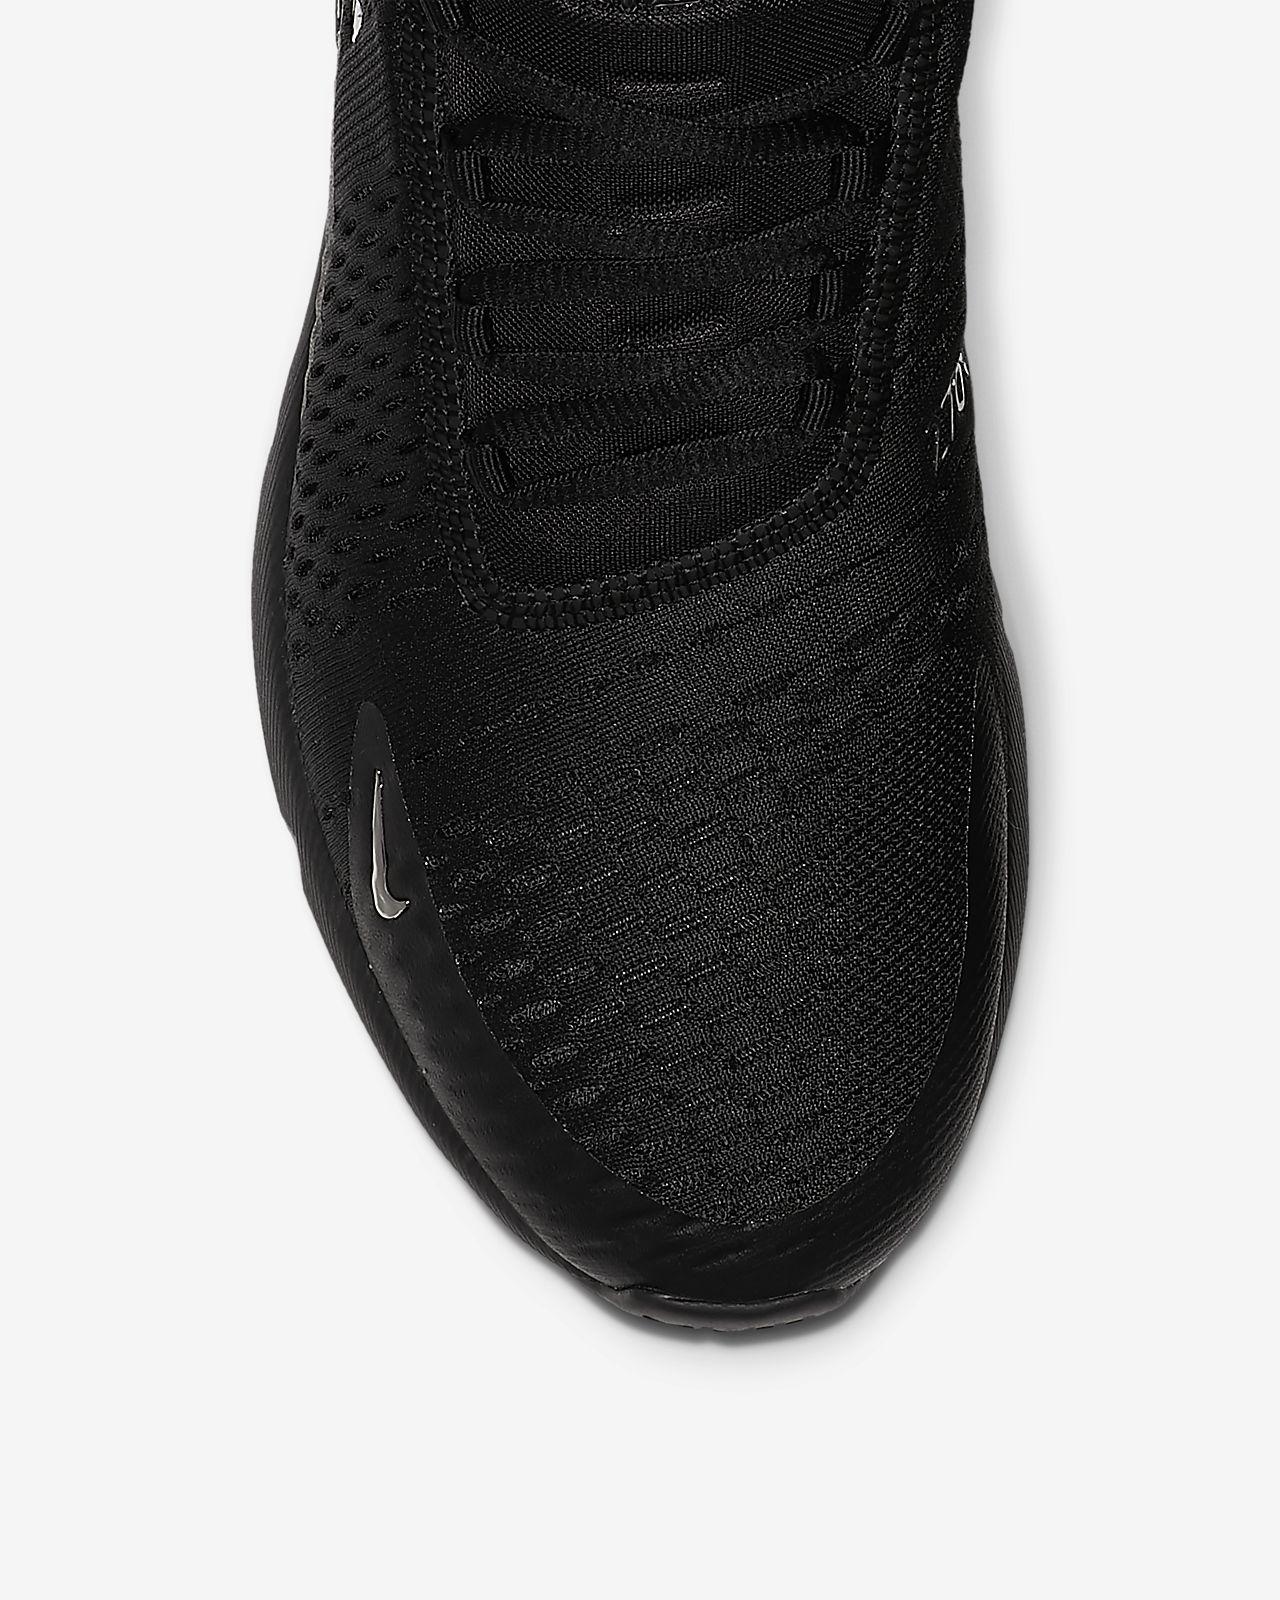 lowest price 13cbe 8c1a2 ... Nike Air Max 270 Men s Shoe